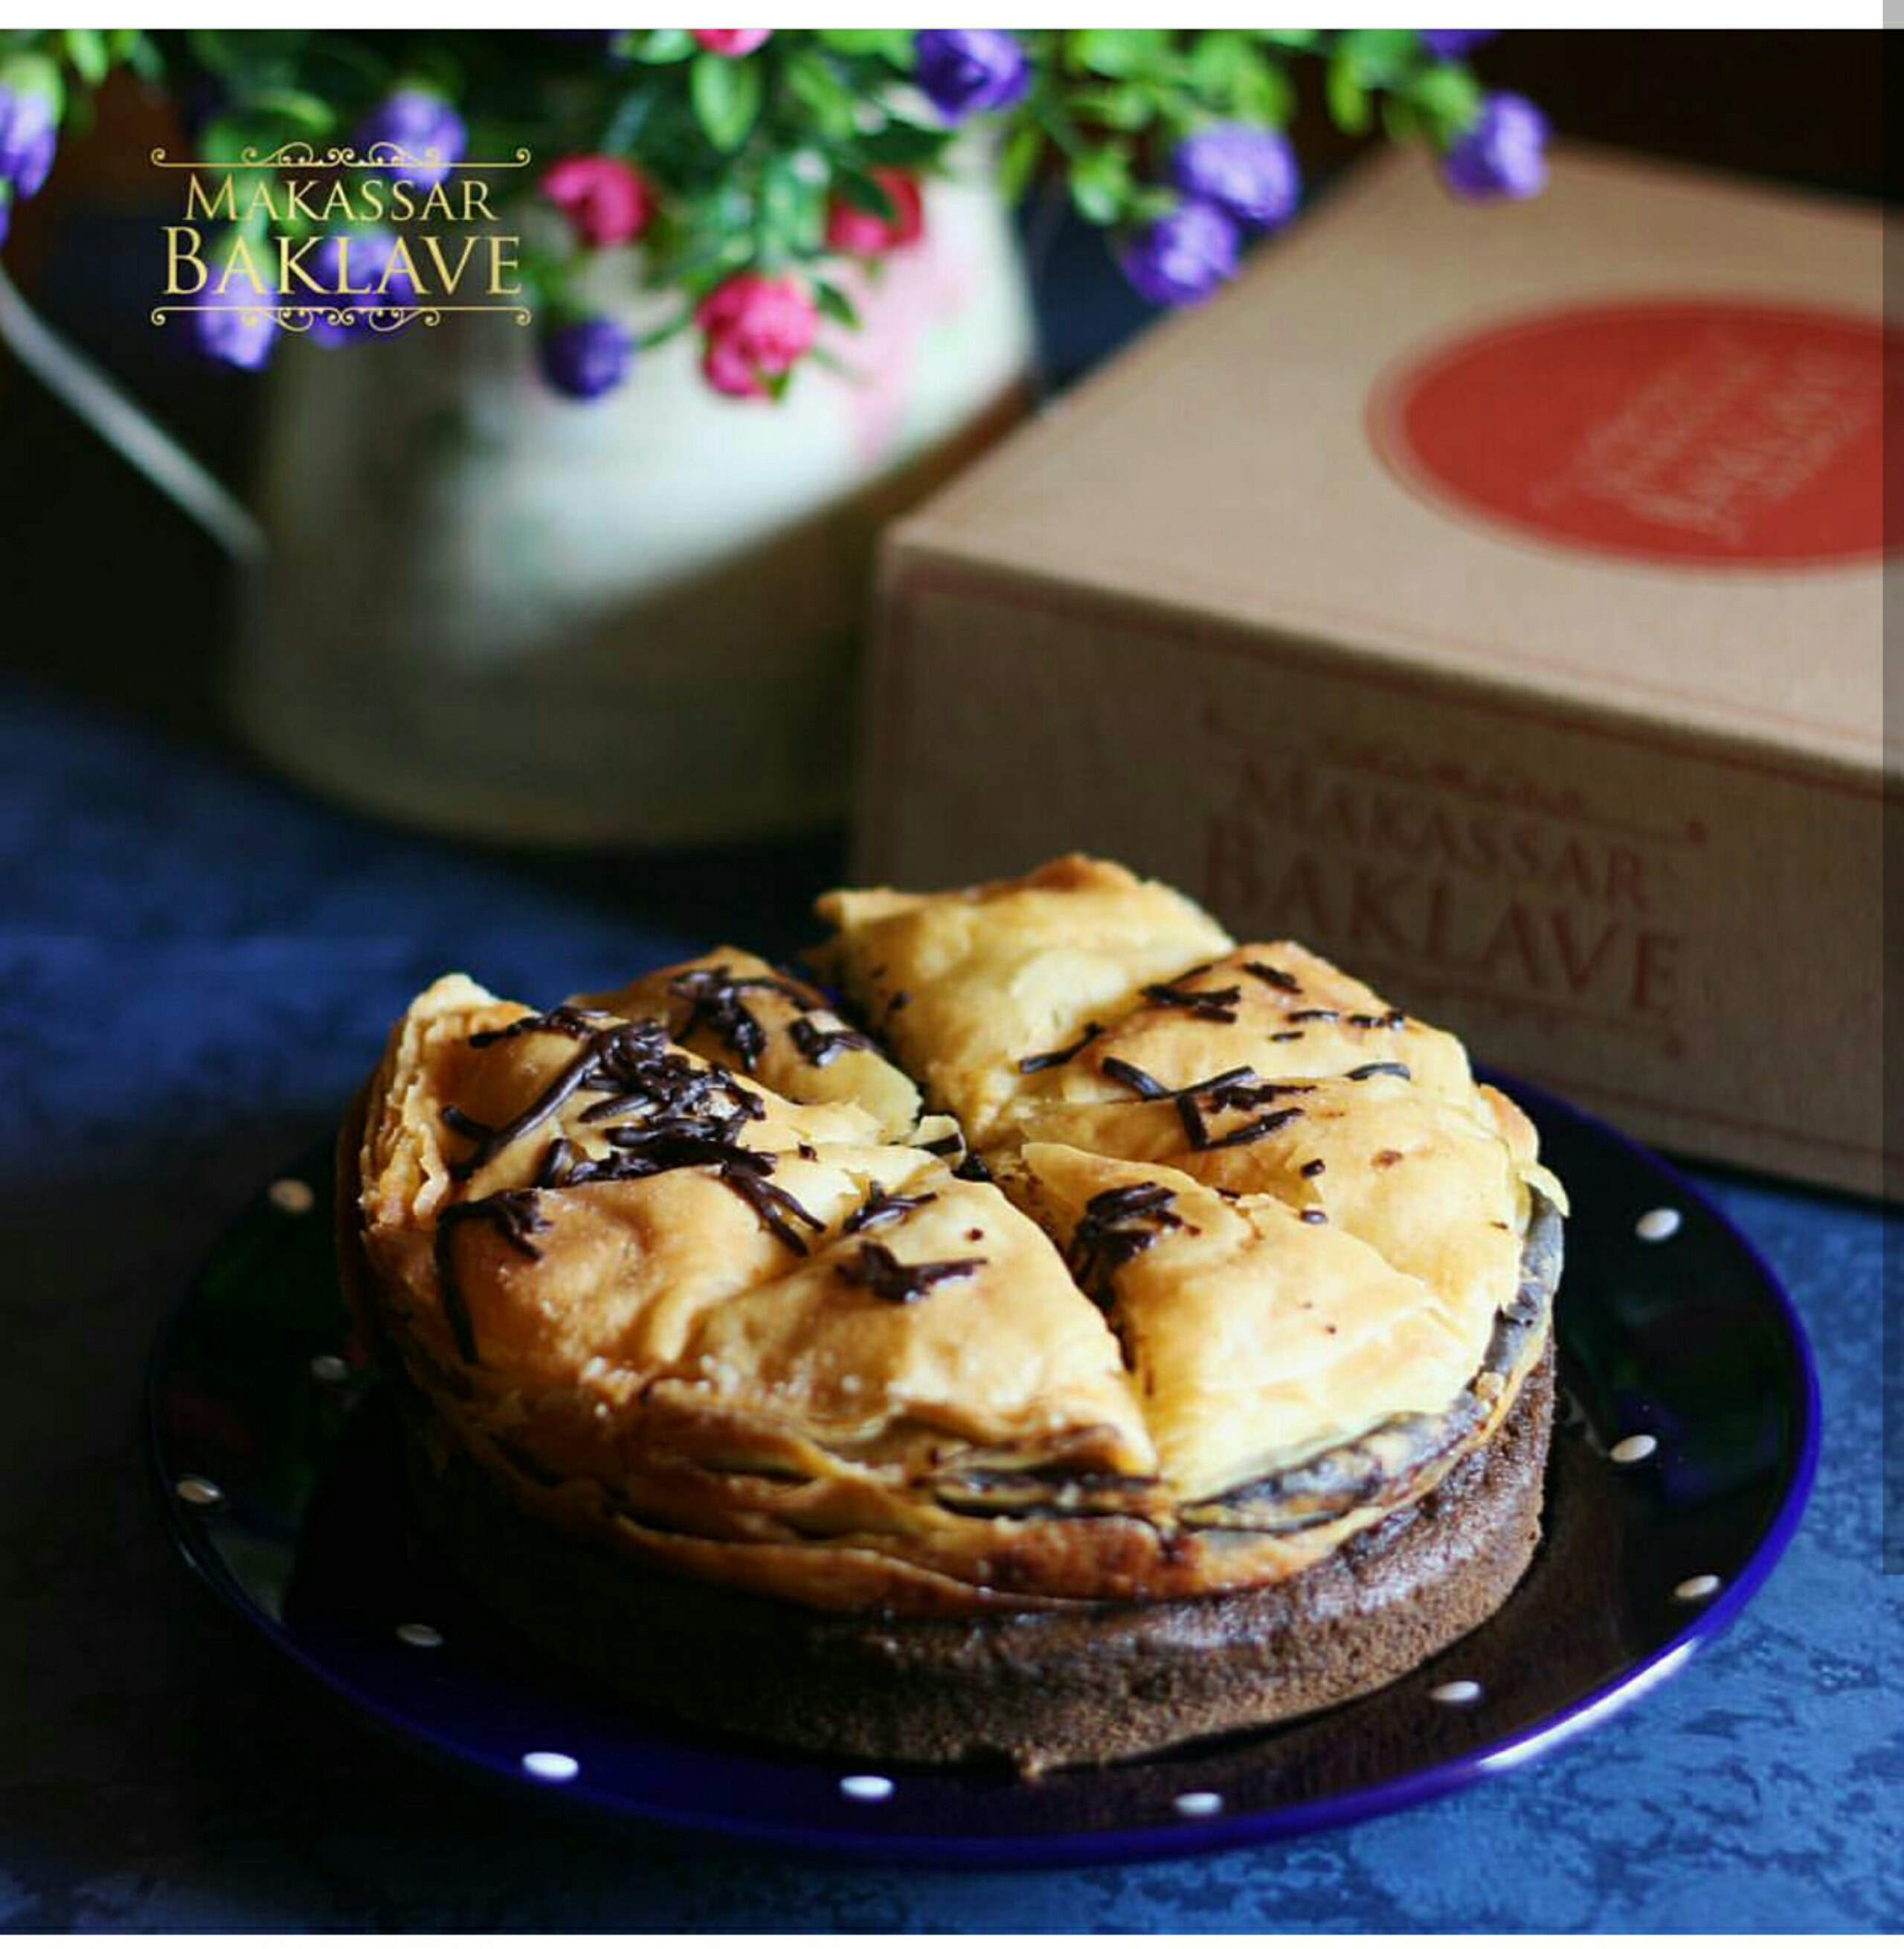 Baklave ini semacam kue dari Turki dan Irfan Hakim mencoba menghadirkannya di makassar Pastry dipadu dengan isian kacang dan cake…sepertinya sedapppp